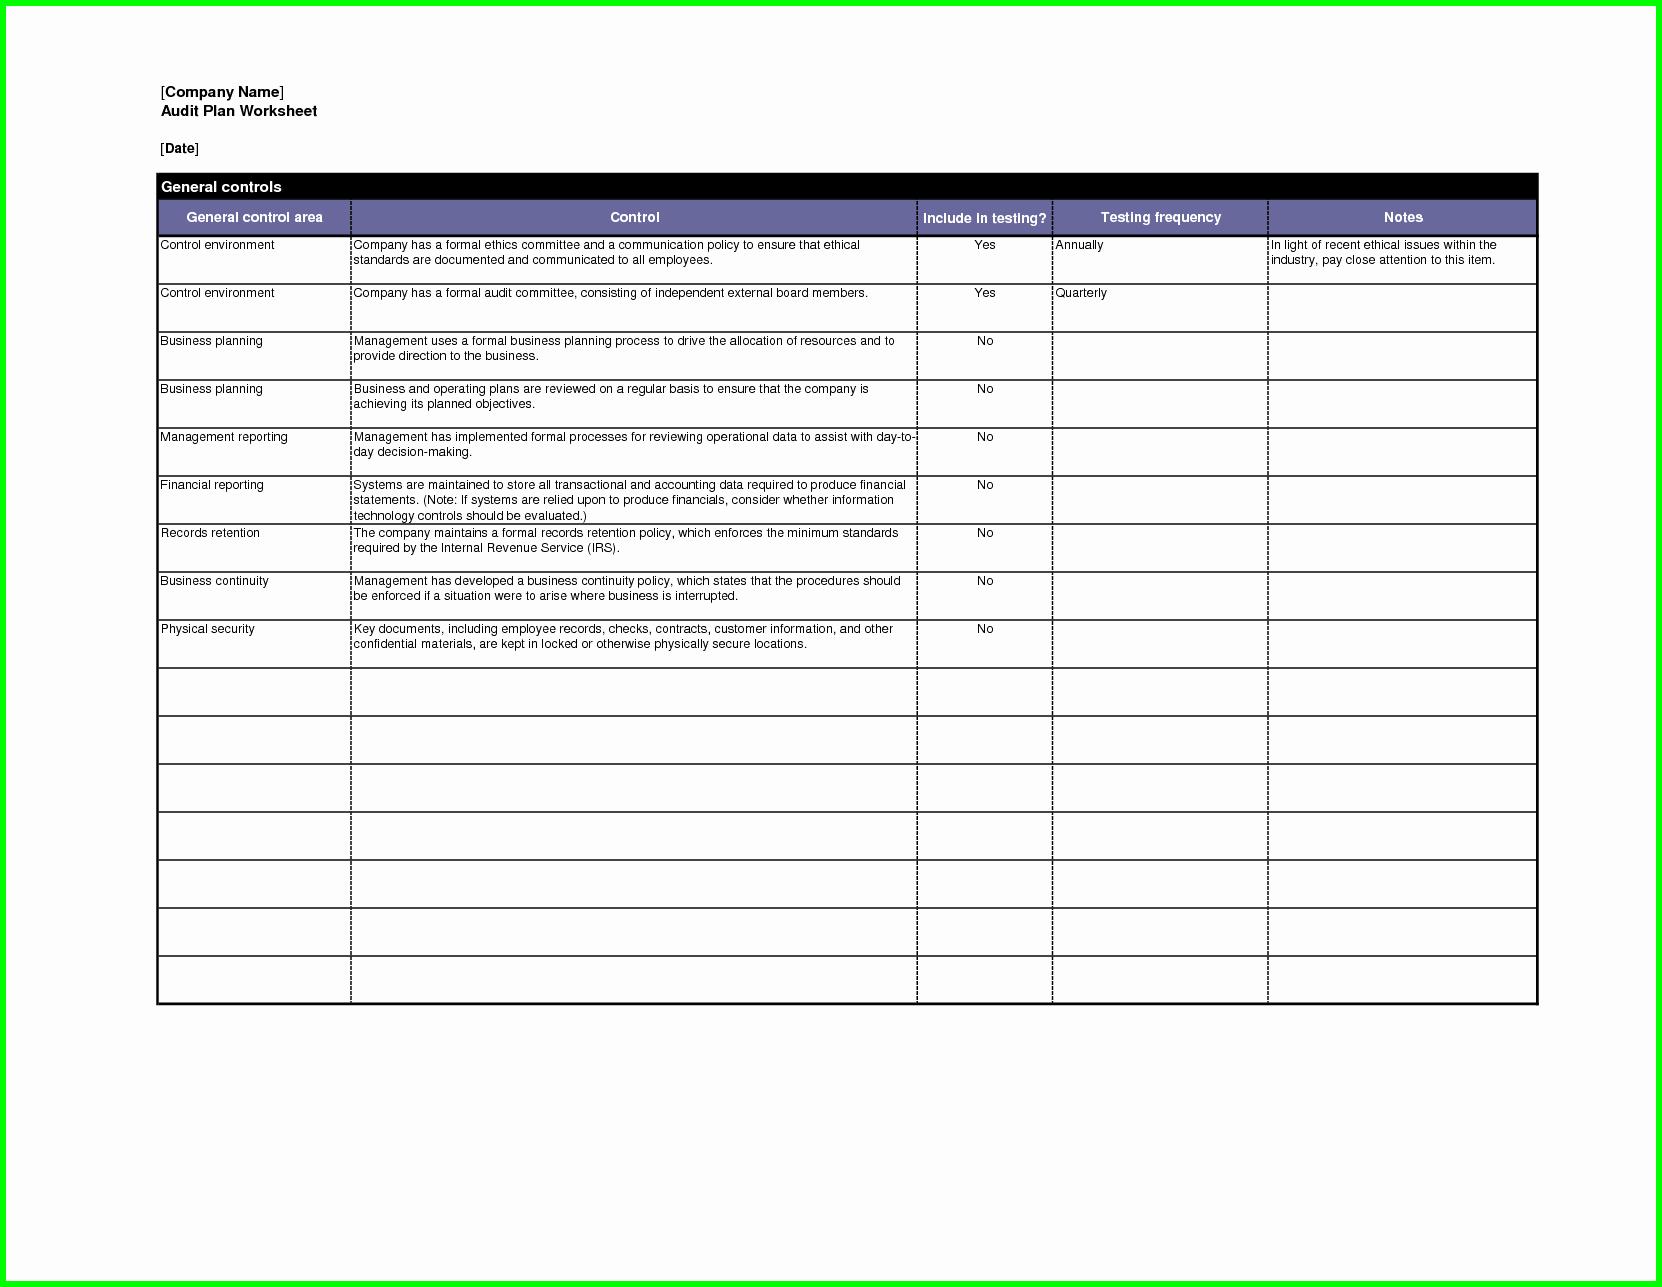 Audit Report Template Excel Beautiful Website Audit Report Template and Audit Plan Template